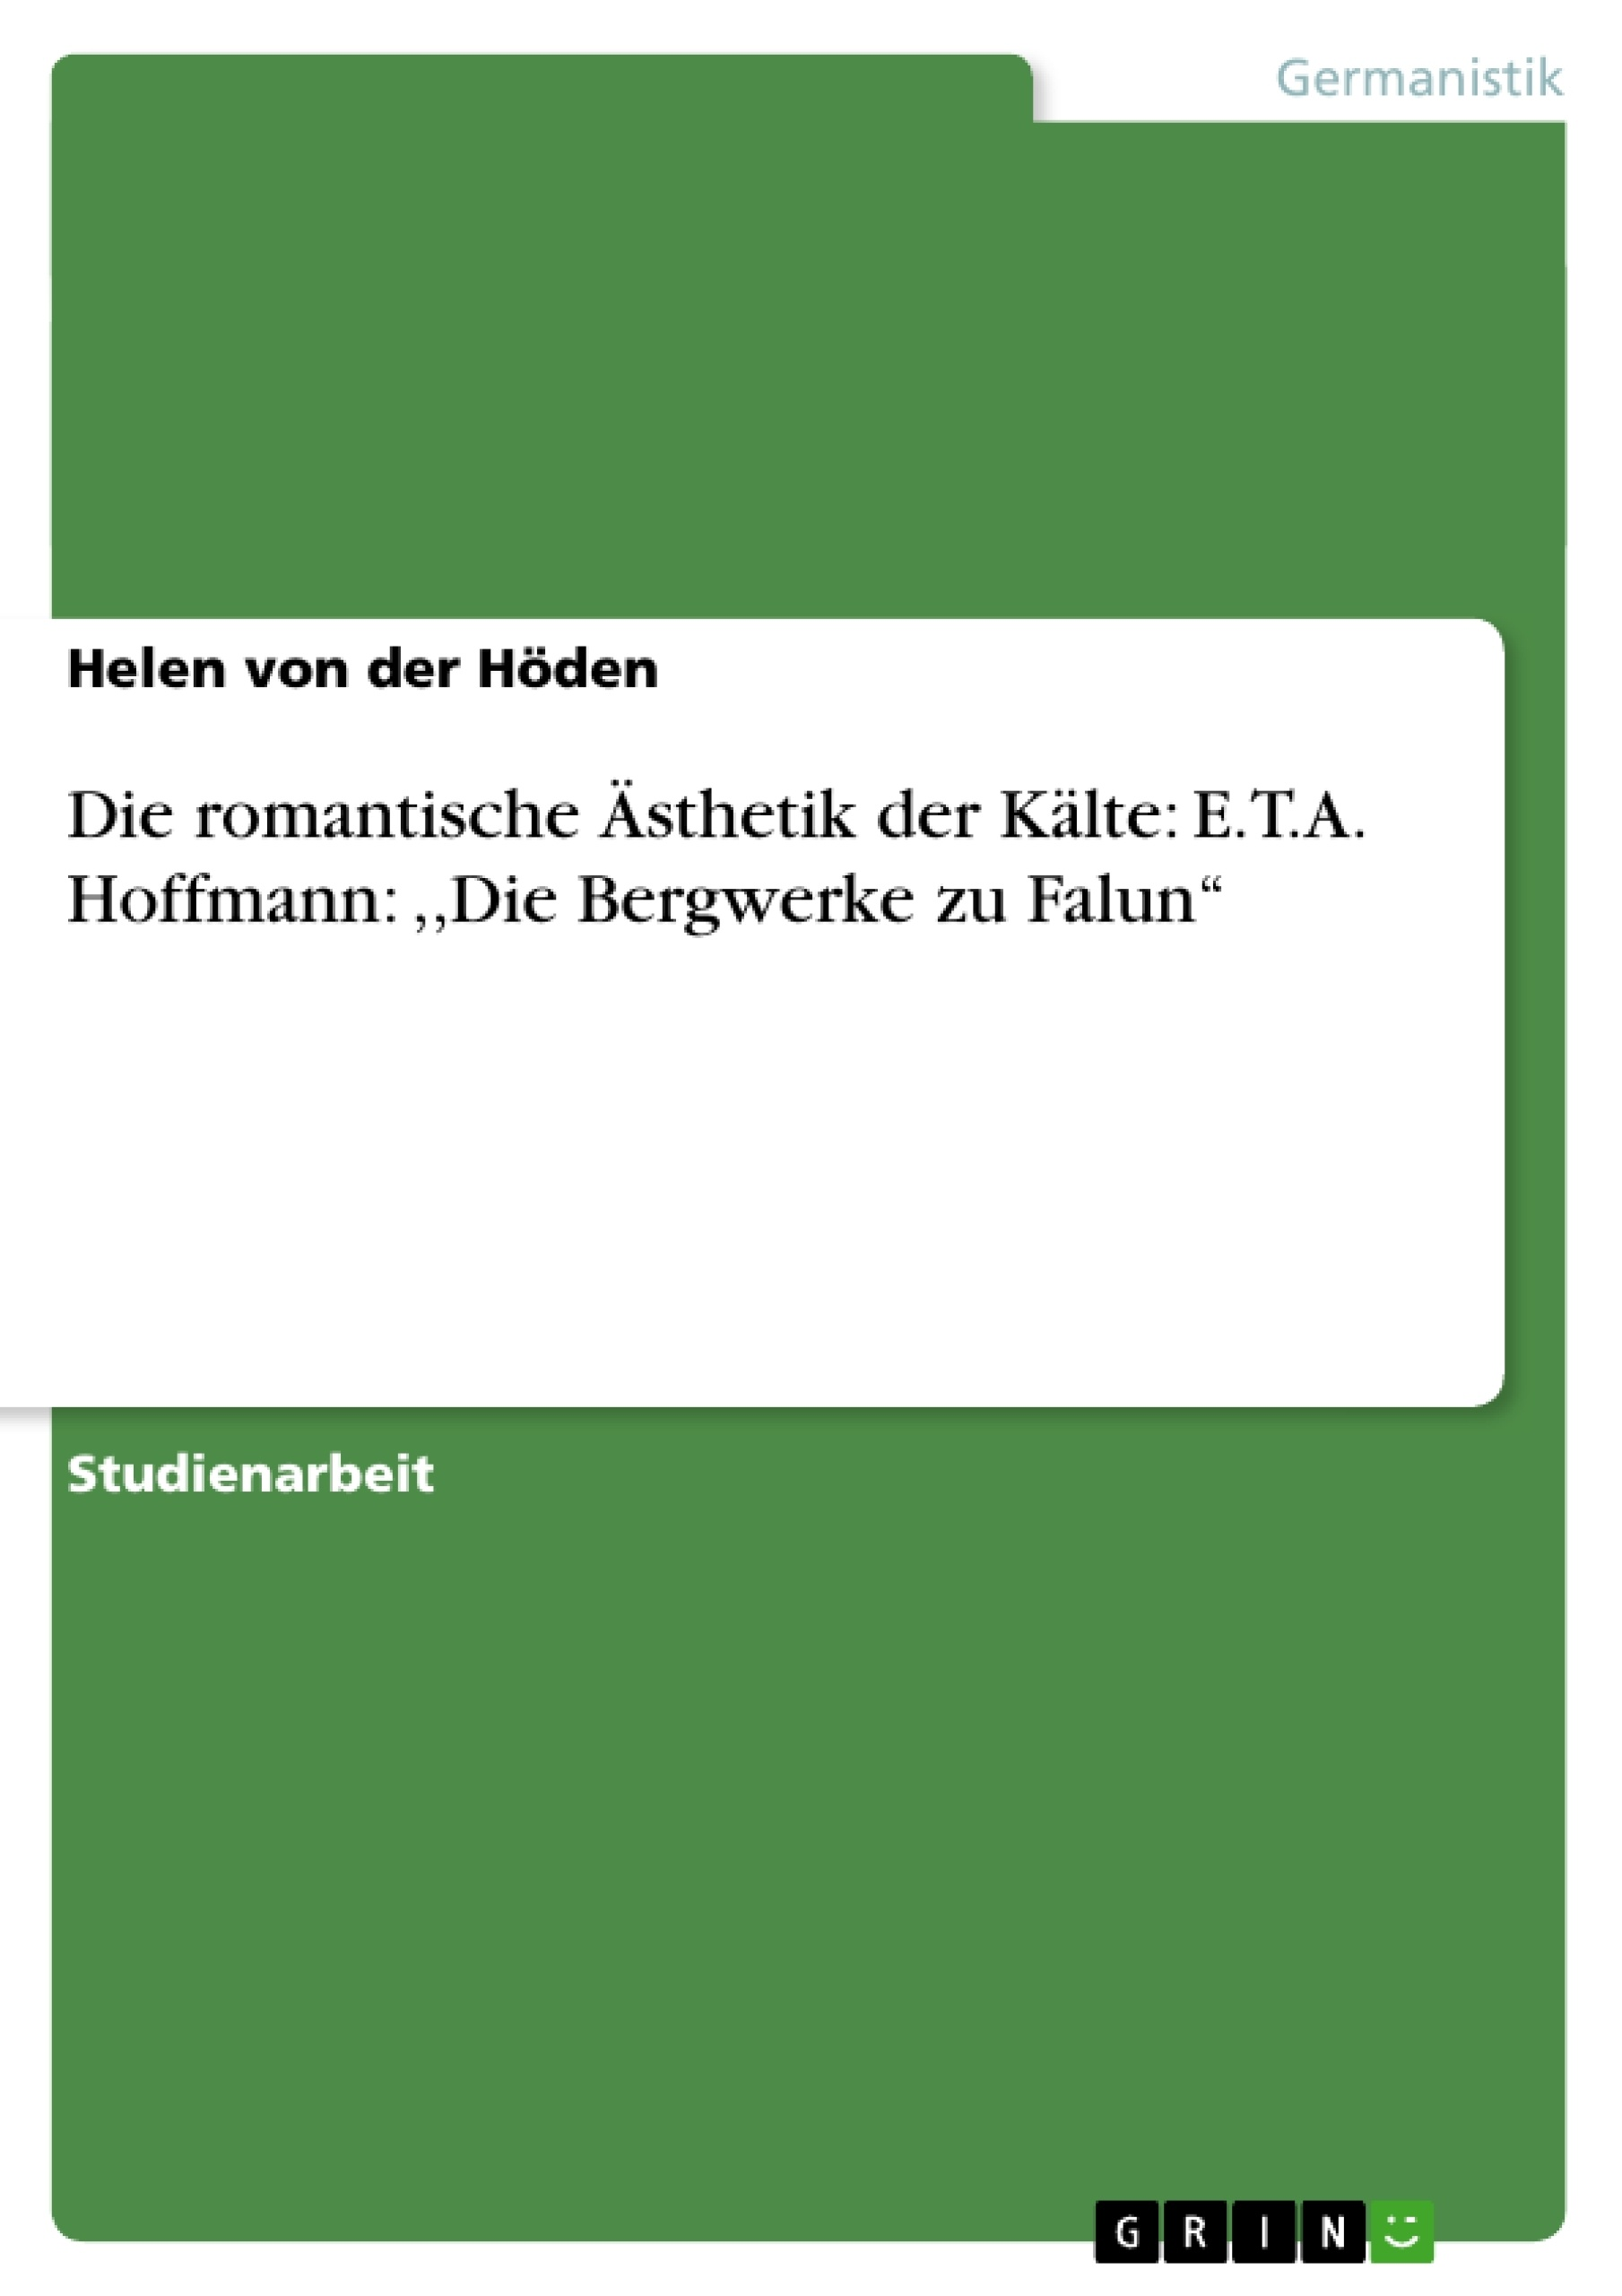 "Titel: Die romantische Ästhetik der Kälte: E.T.A. Hoffmann: ,,Die Bergwerke zu Falun"""